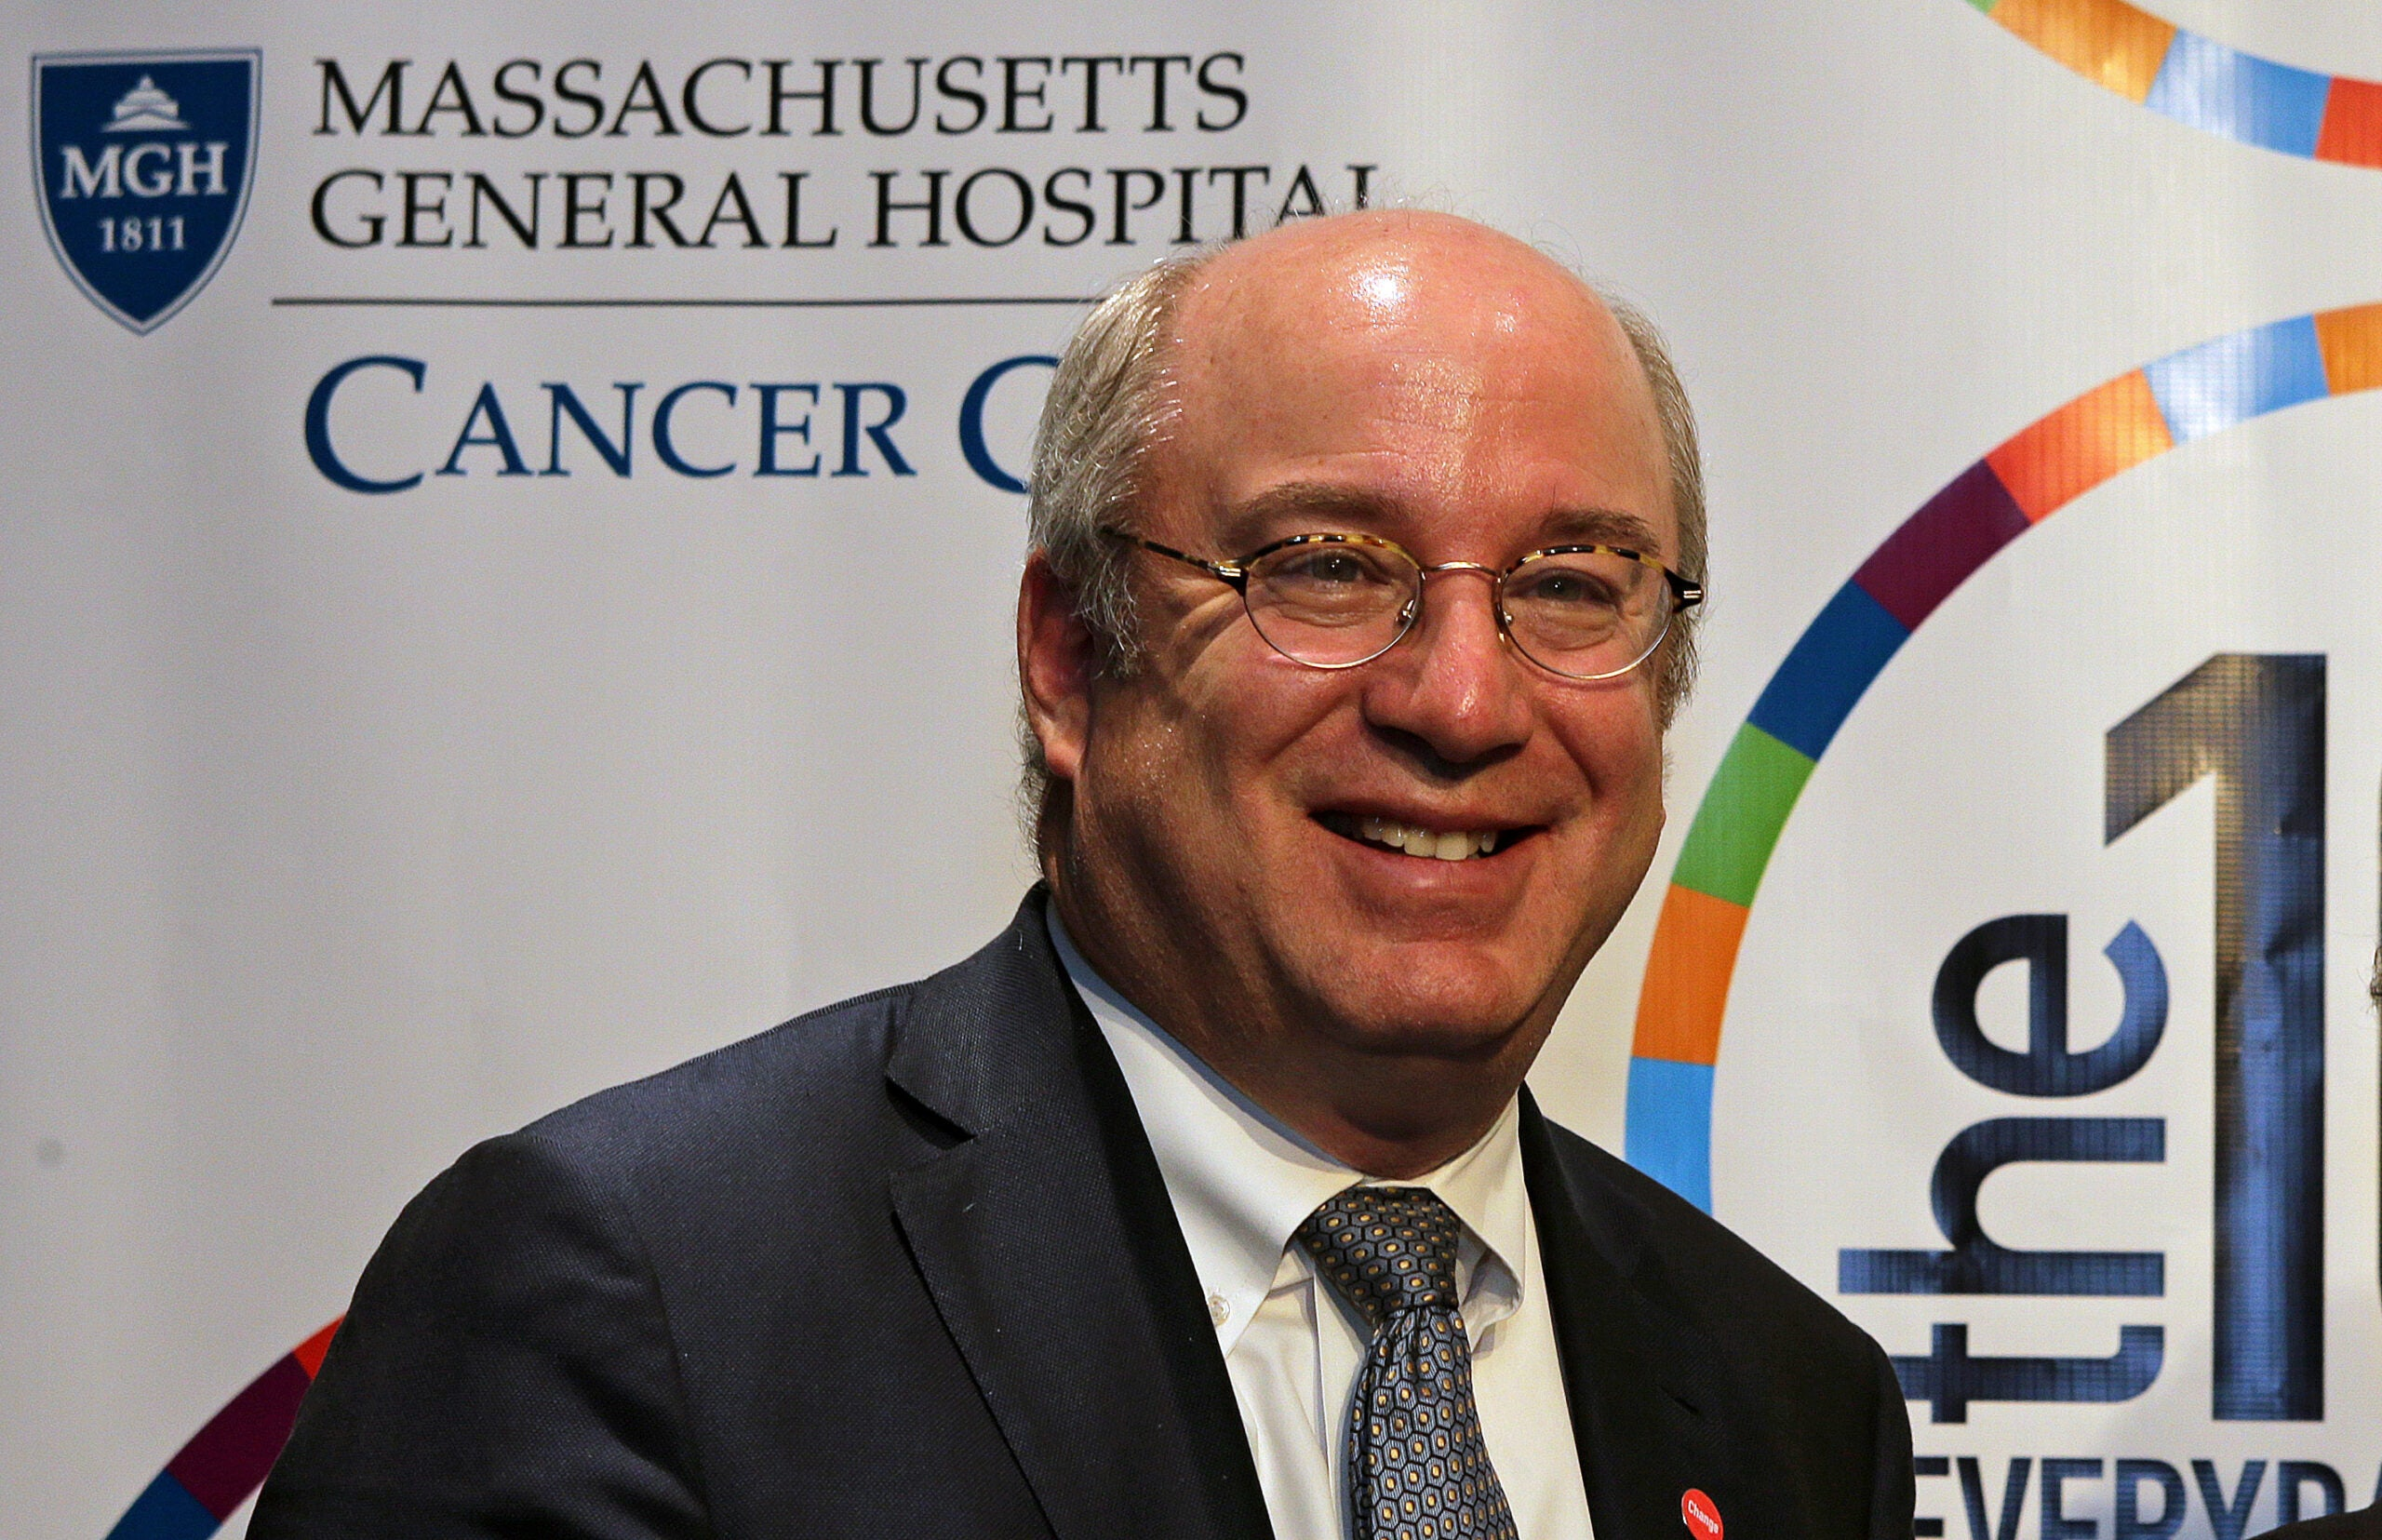 Dr. Peter Slavin